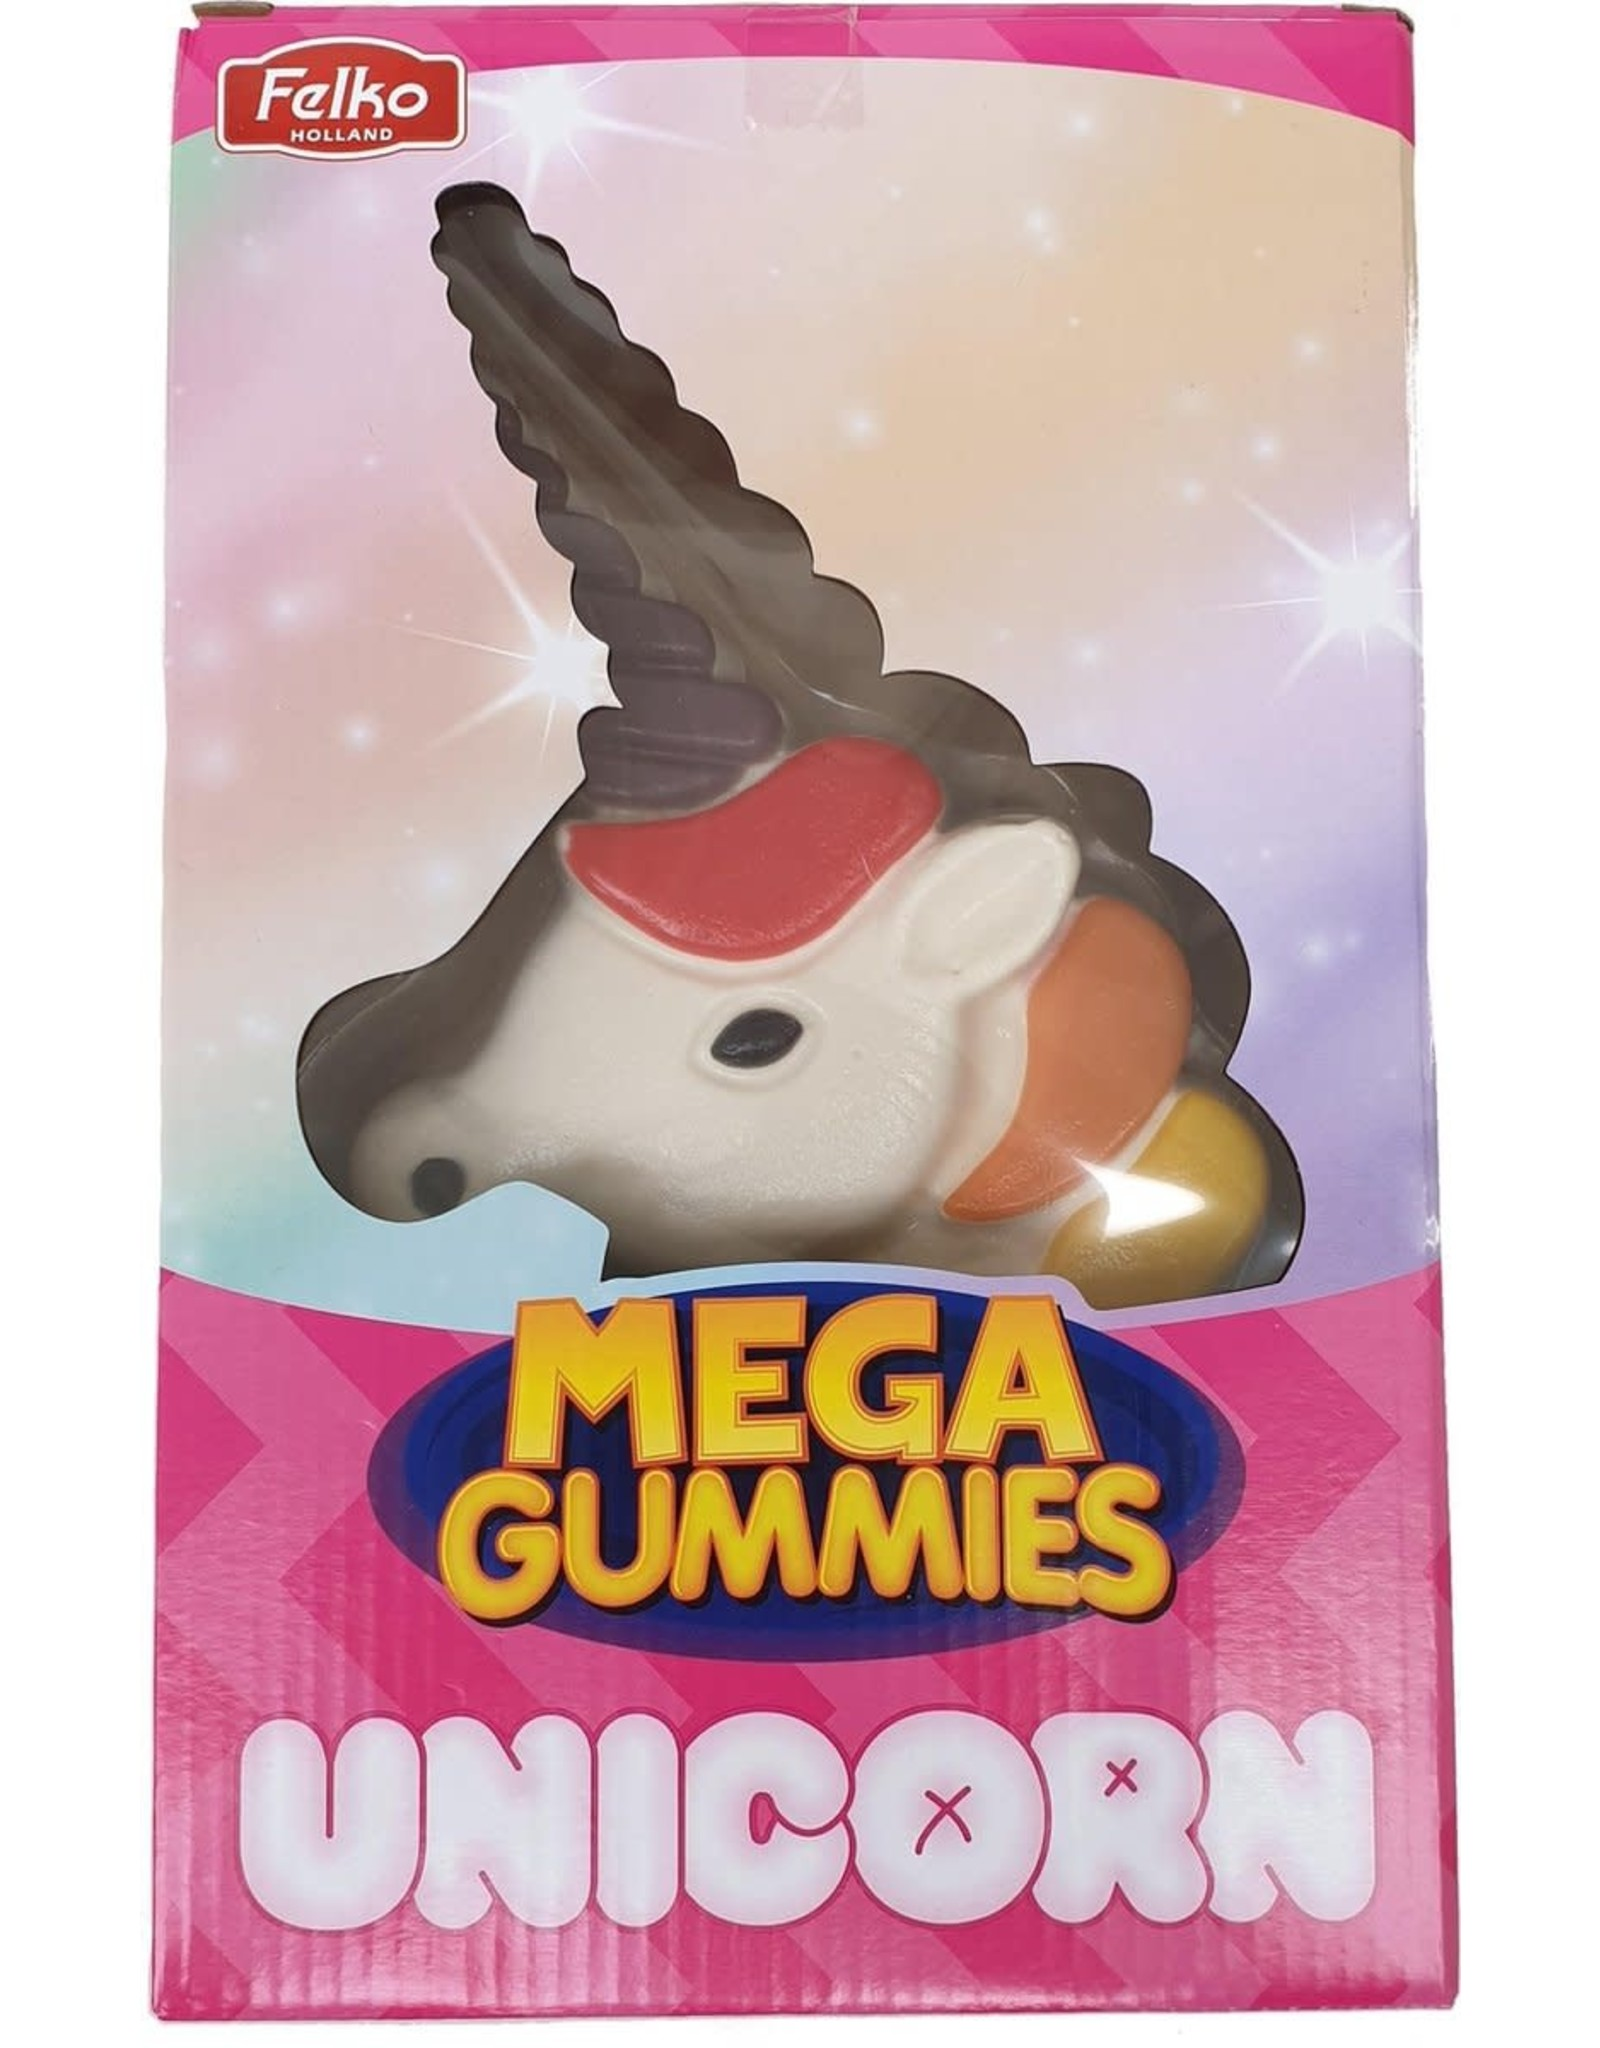 Mega Gummies - Unicorn - 600g